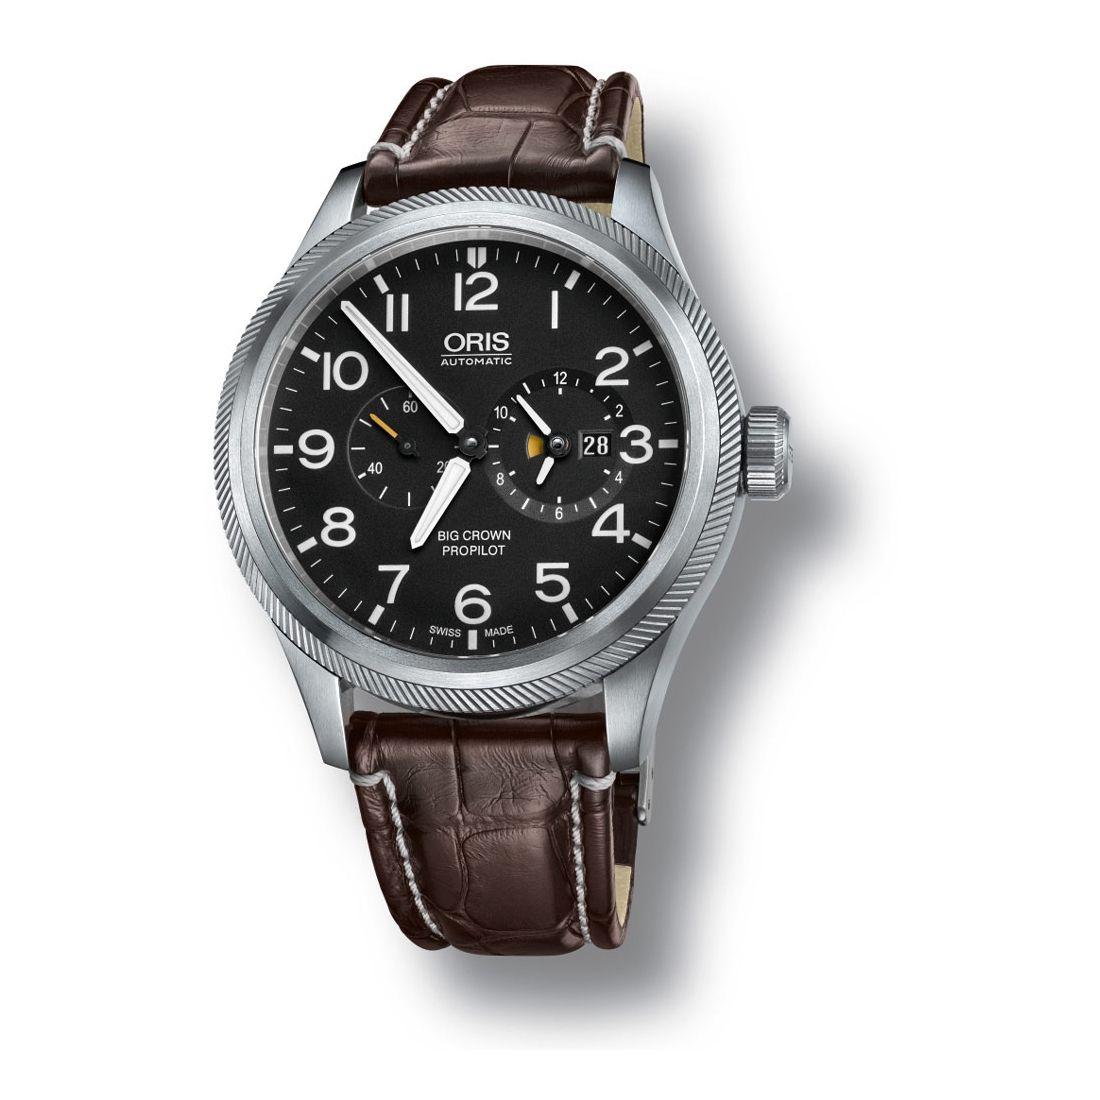 Reloj Oris Big Crown Propilot Worldtimer - 01 690 7735 4164-07 1 22 72FC  - 1